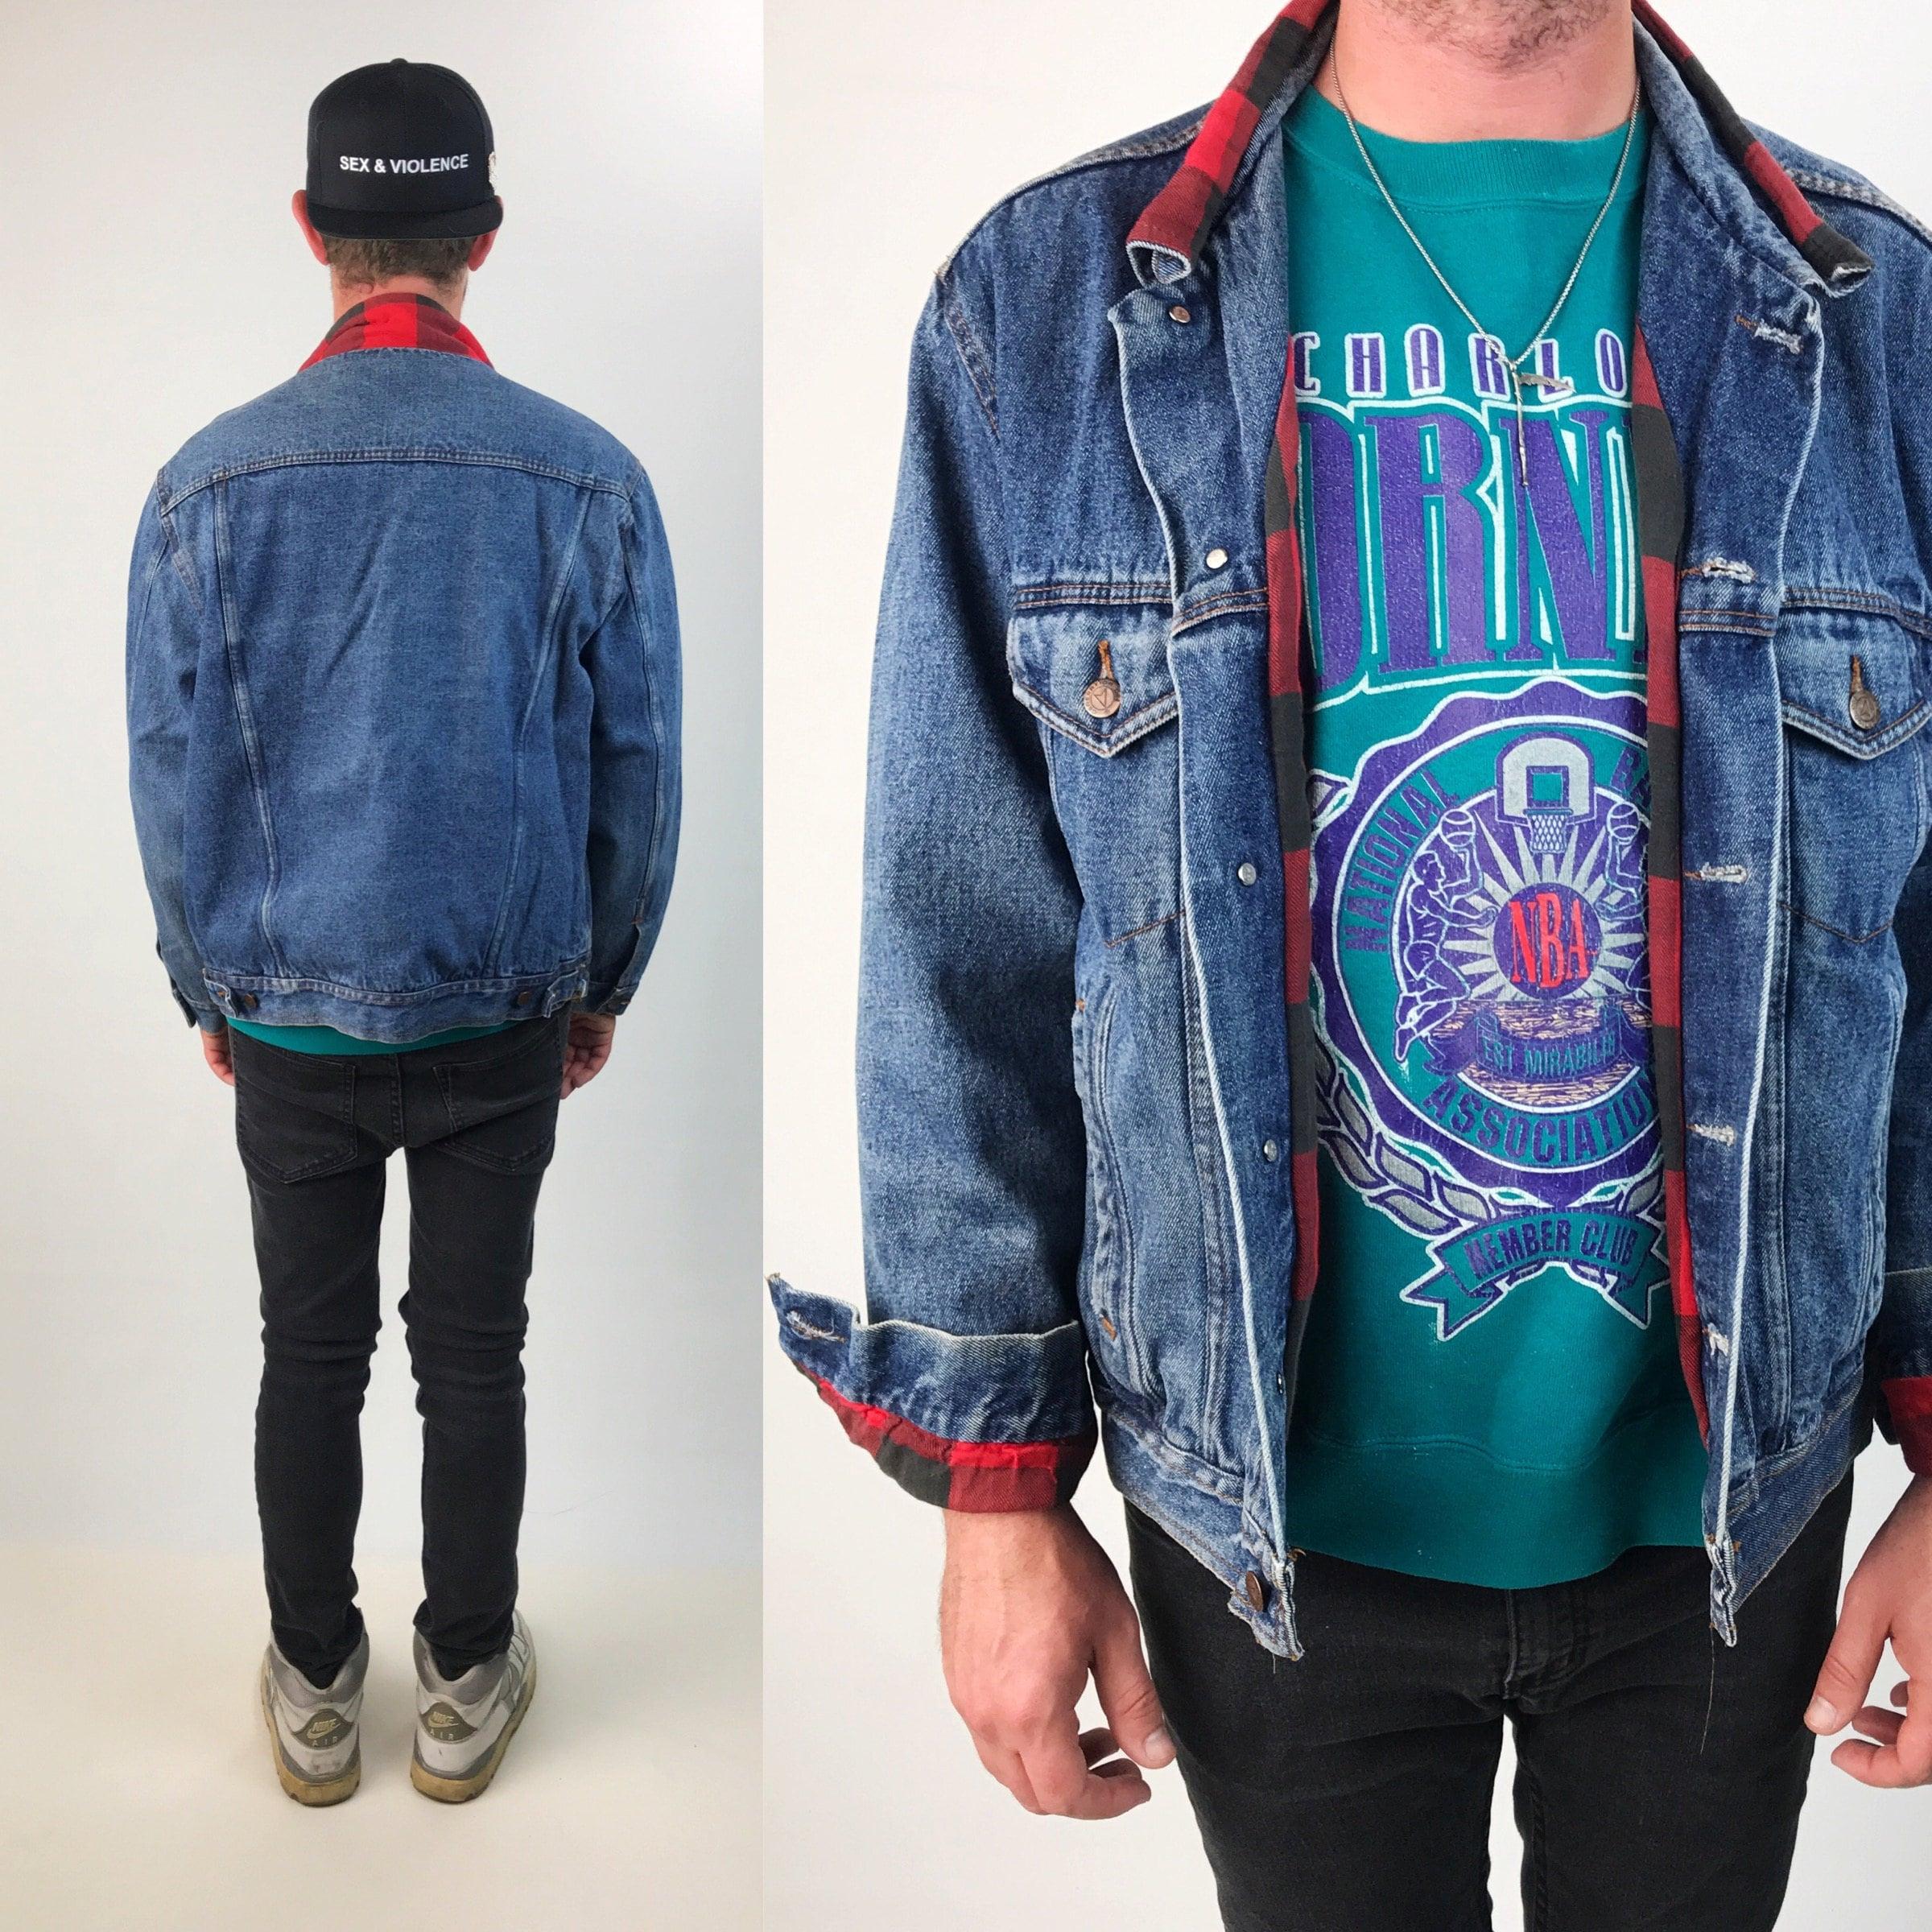 90 S Denim Jacket With Red Plaid Lining Xl Plus Soft Jean Jacket